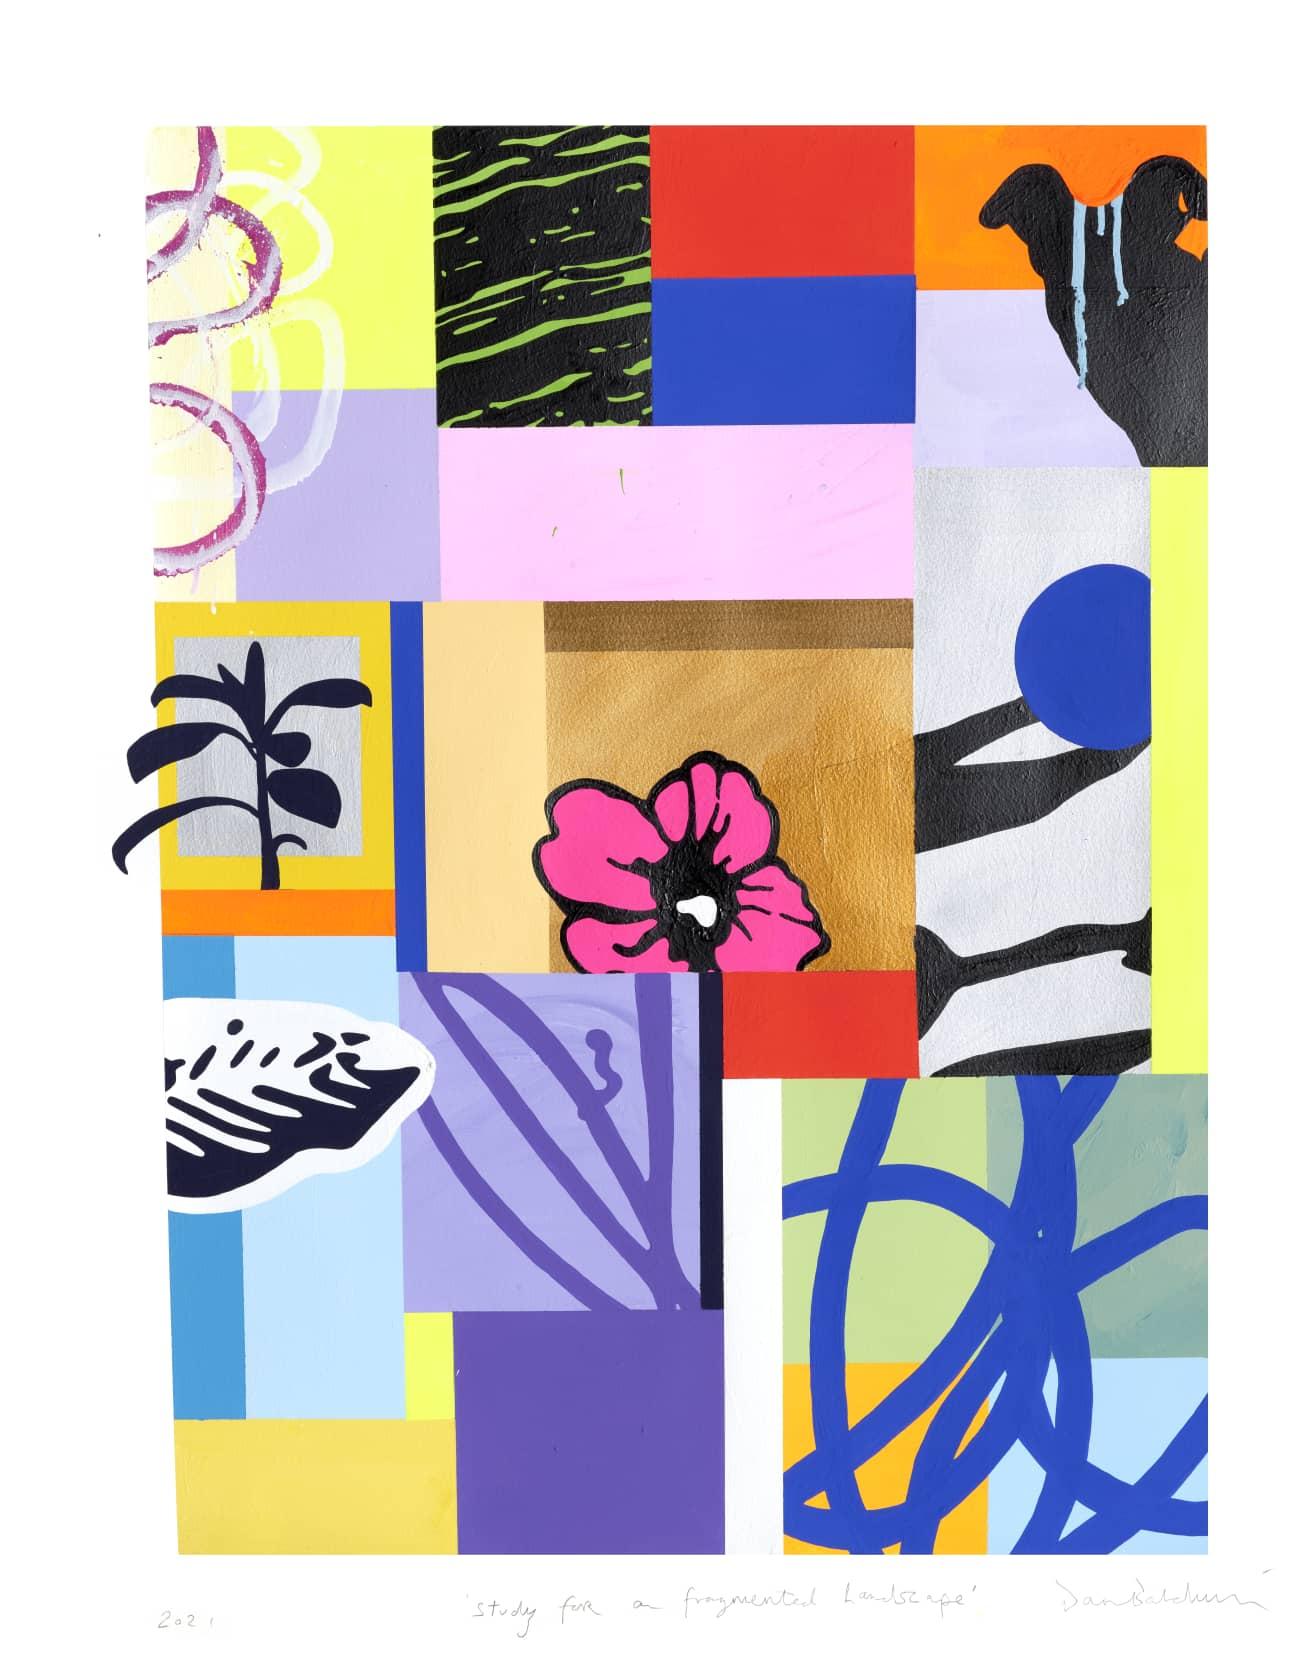 Dan Baldwin, Study for Fragmented Landscape, 2021